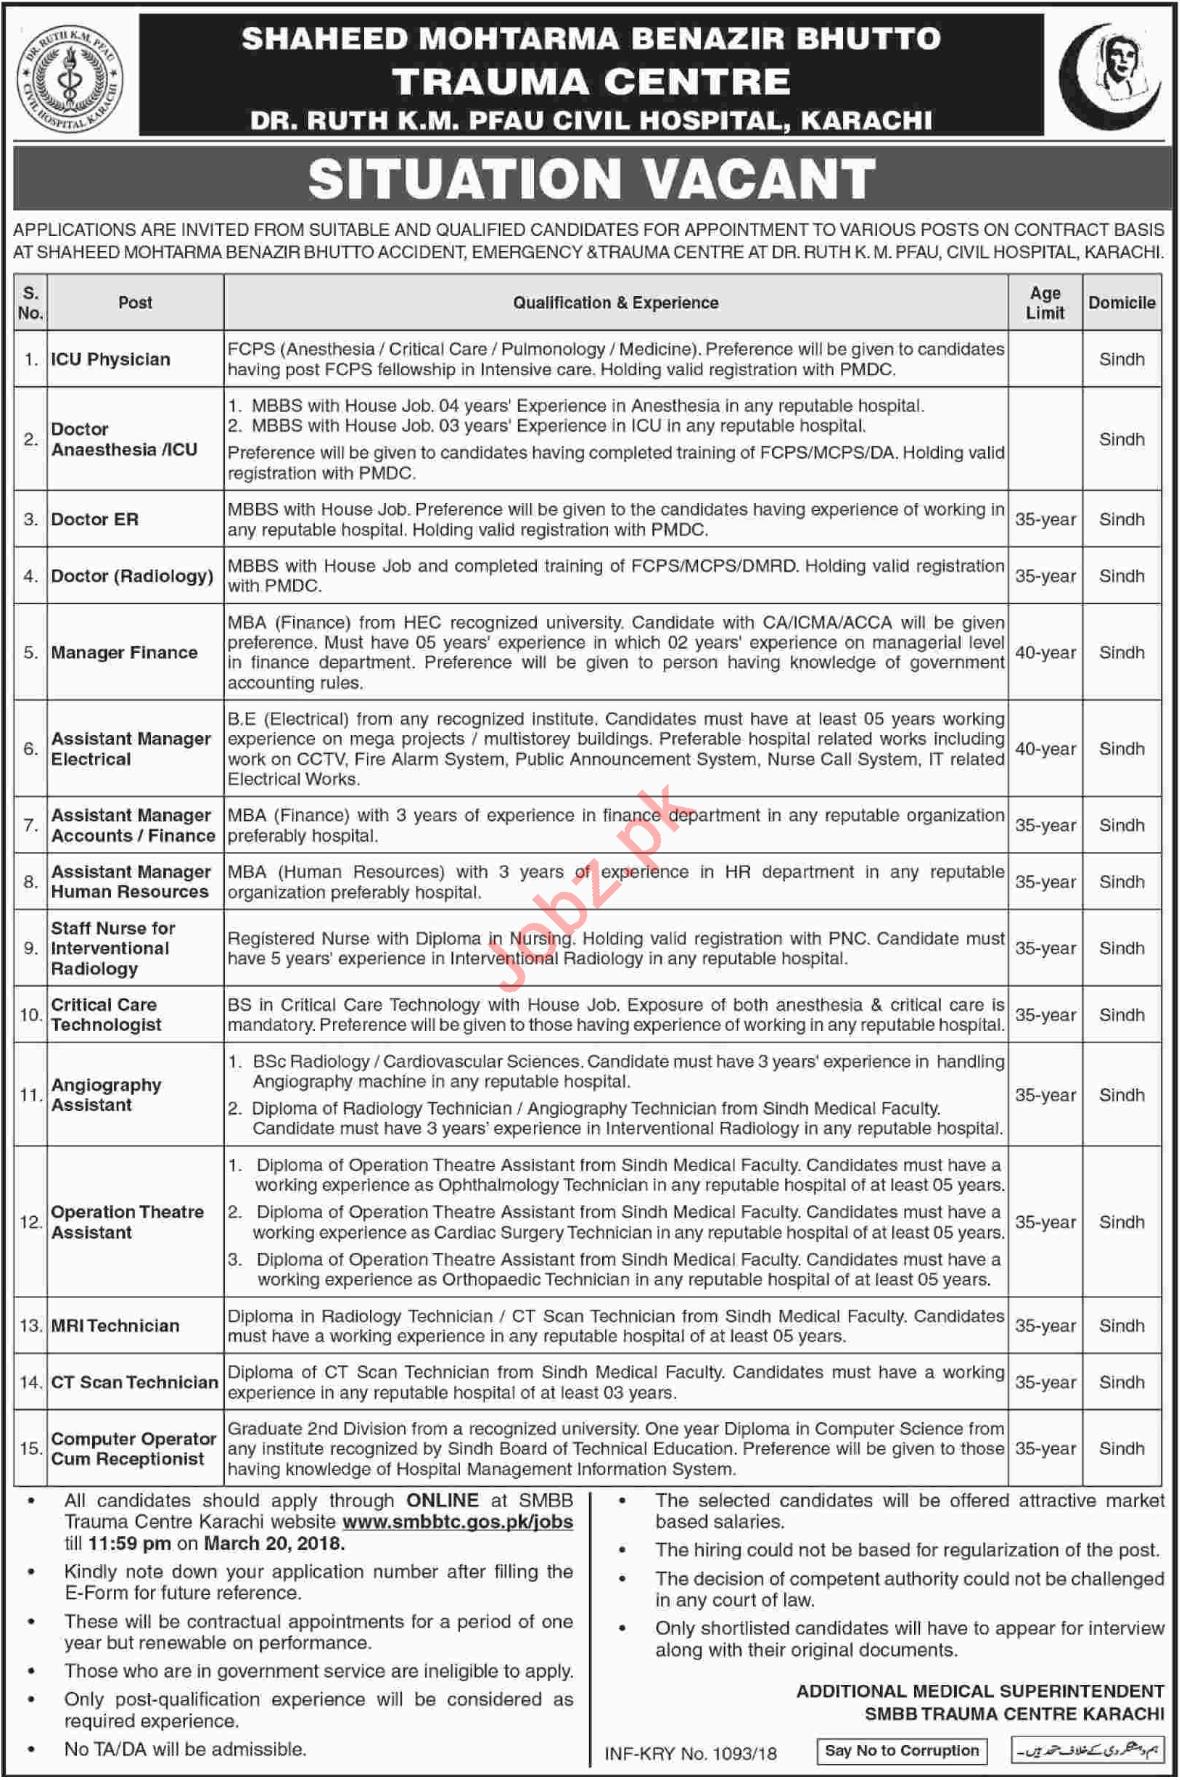 SMBB Trauma Centre Civil Hospital Karachi Jobs 2018 2019 Job